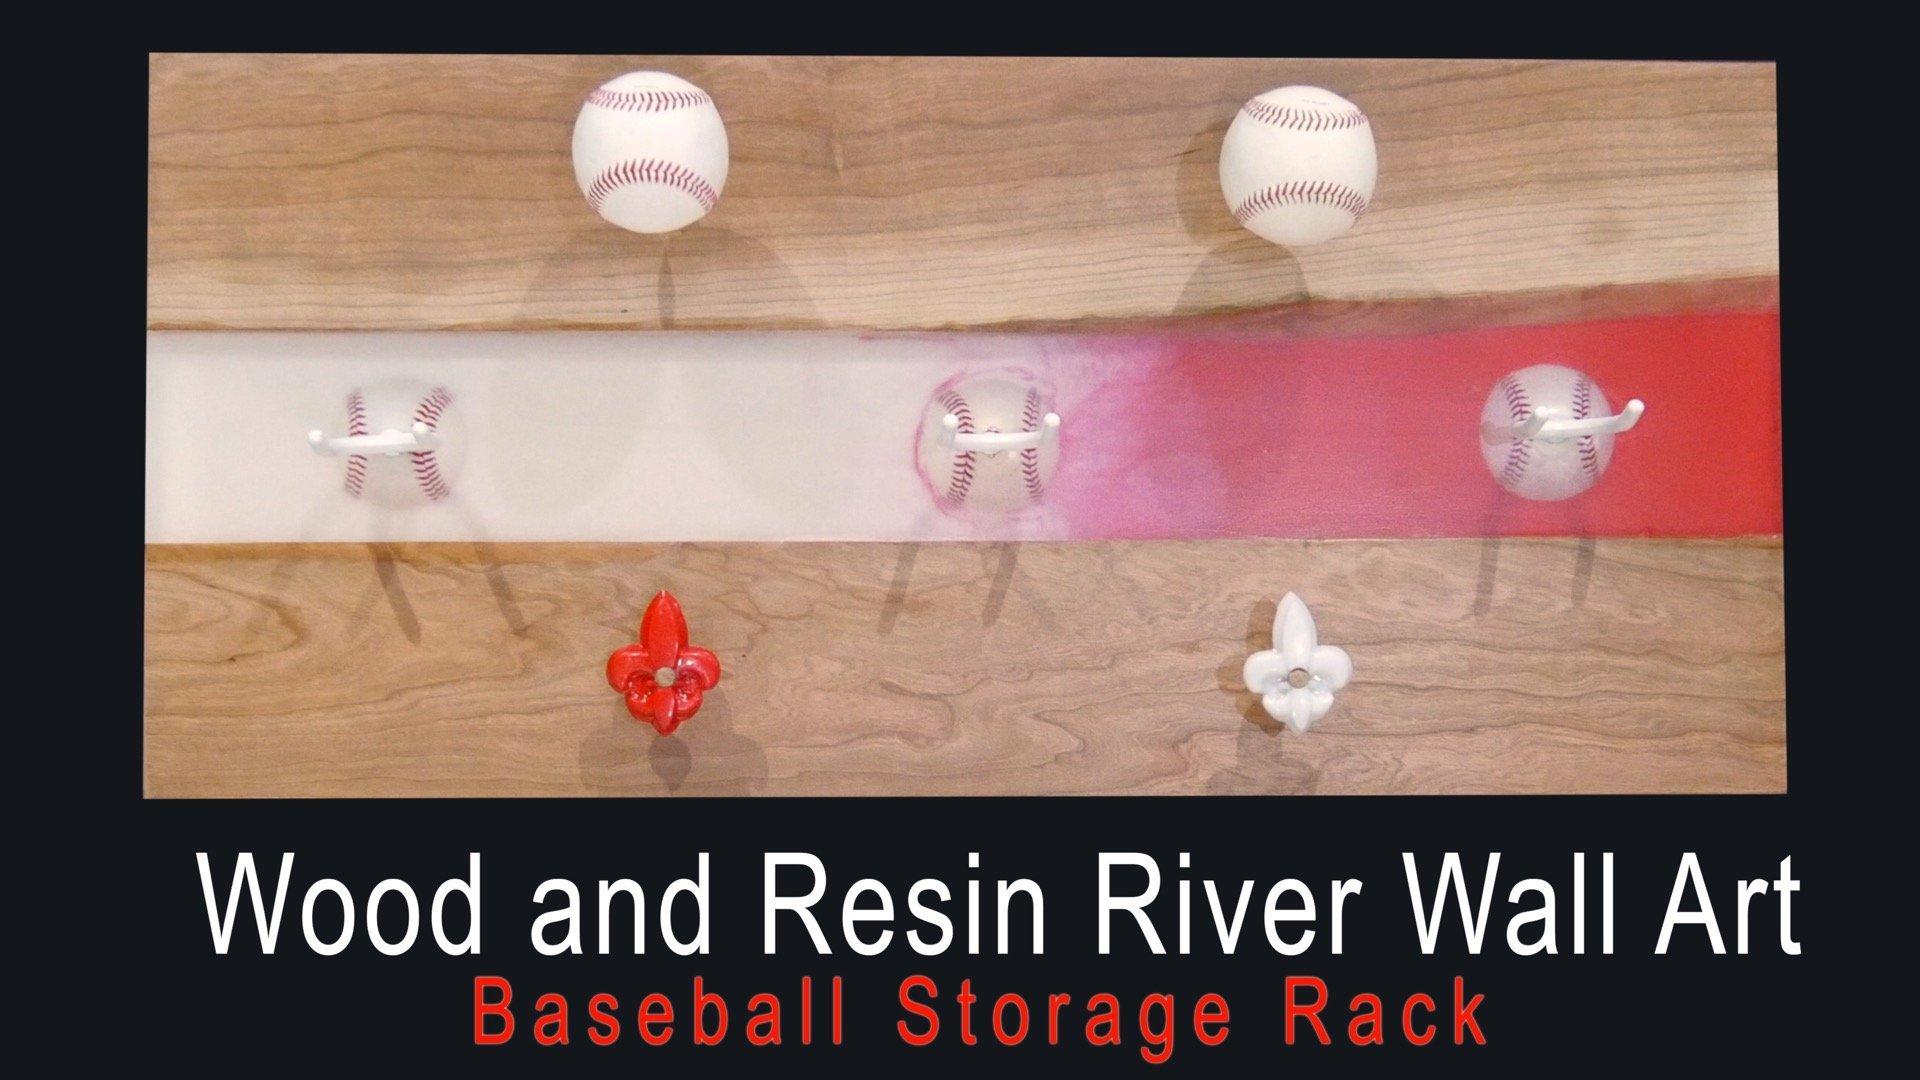 Wood and Resin River Wall Art - Baseball Storage Rack